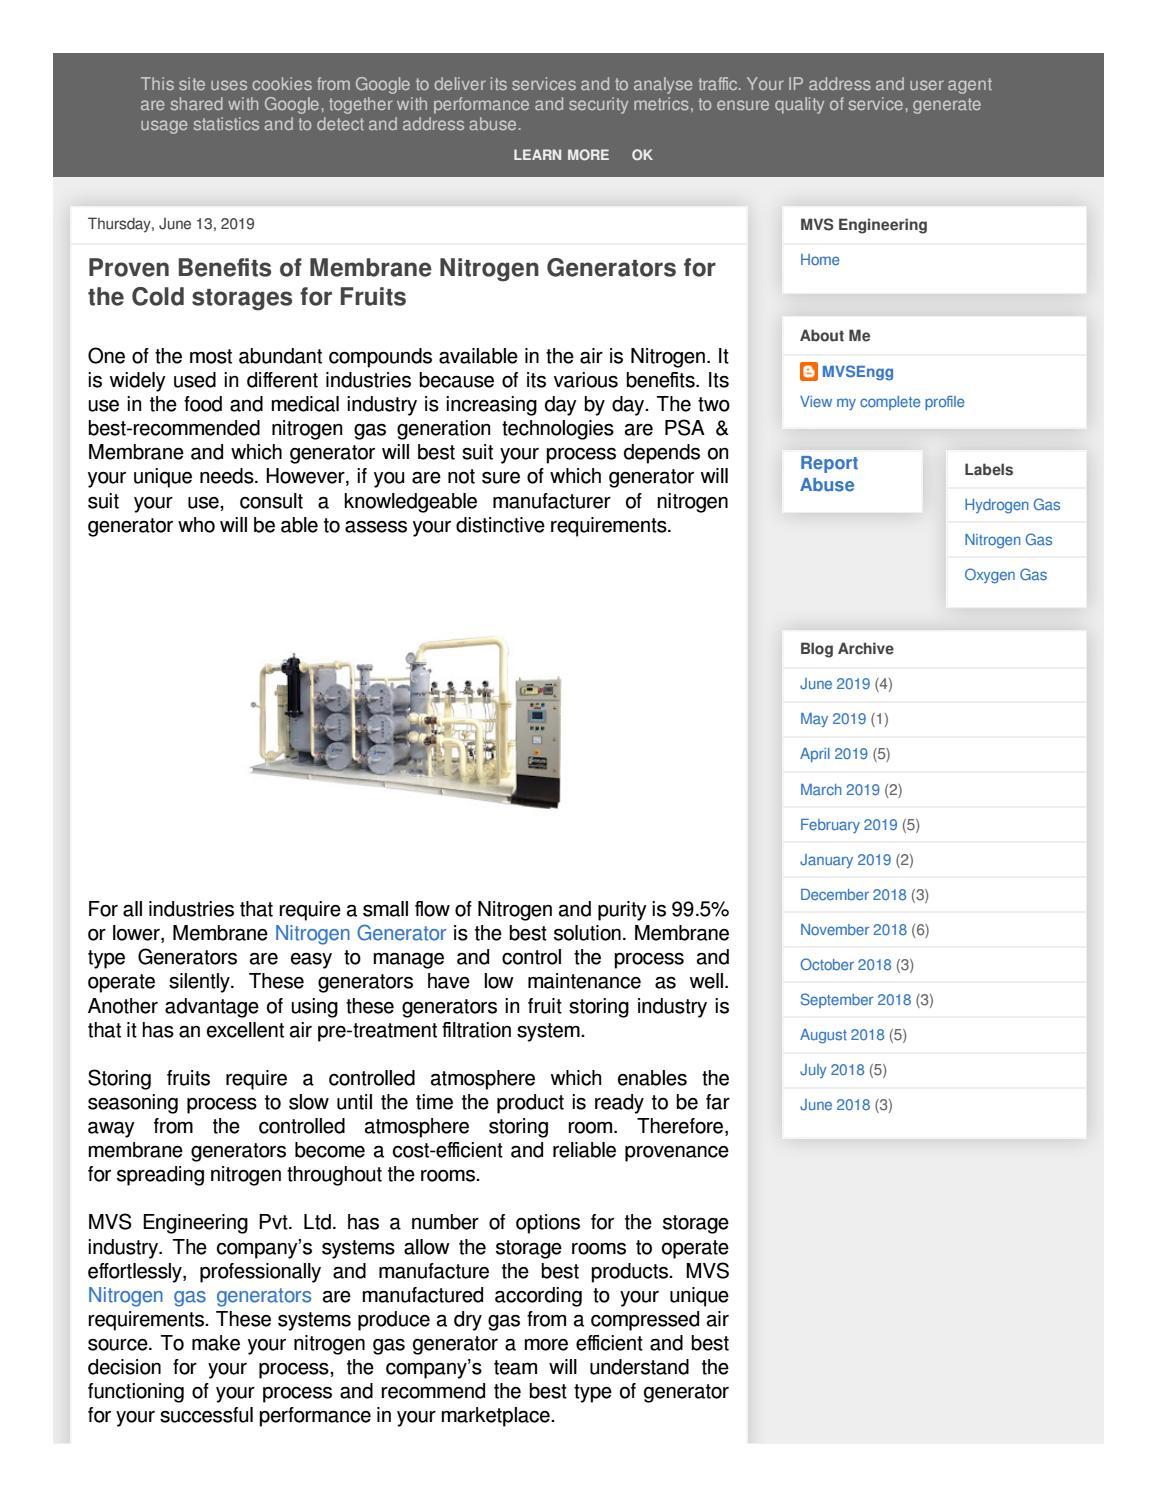 Proven Benefits Of Membrane Nitrogen Generators For The Cold